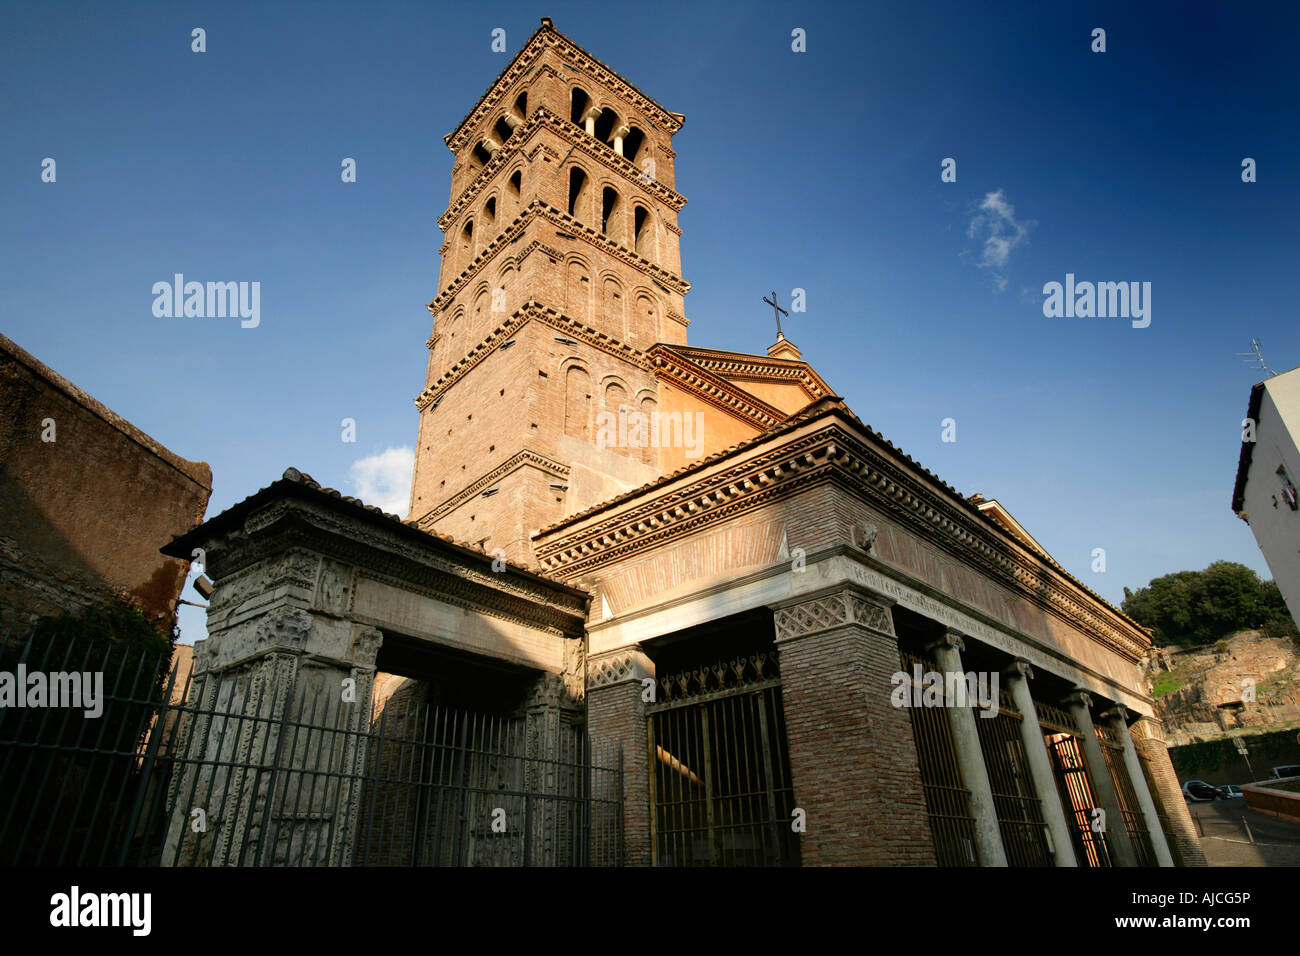 Argentarii stock photos argentarii stock images alamy for Arco arredamenti san giorgio